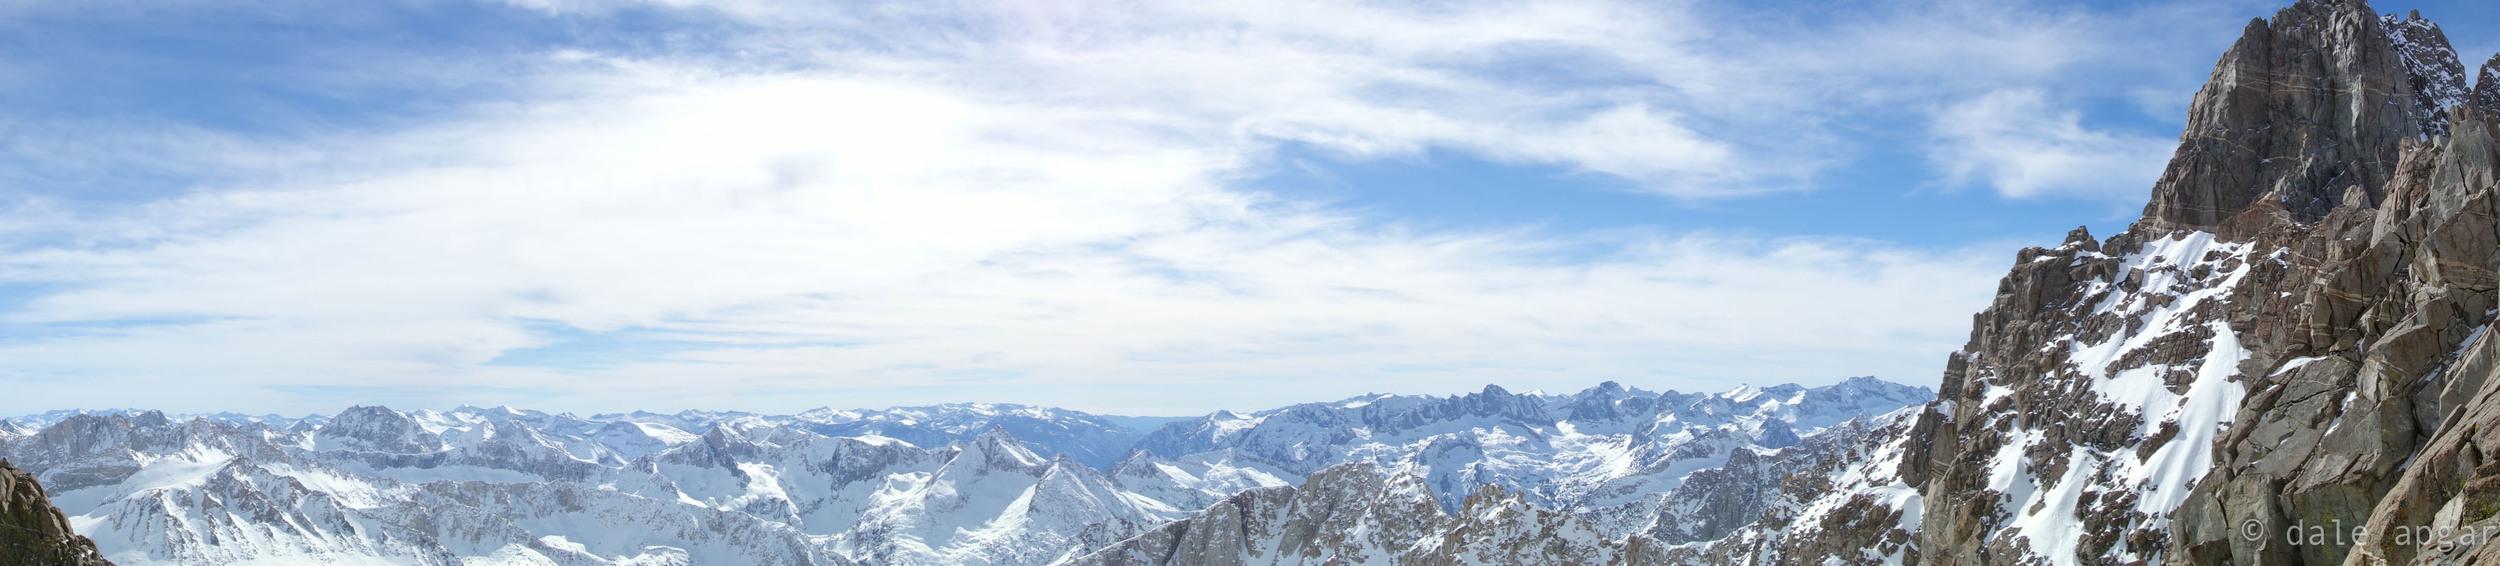 mountain_hangover_one-10.jpg